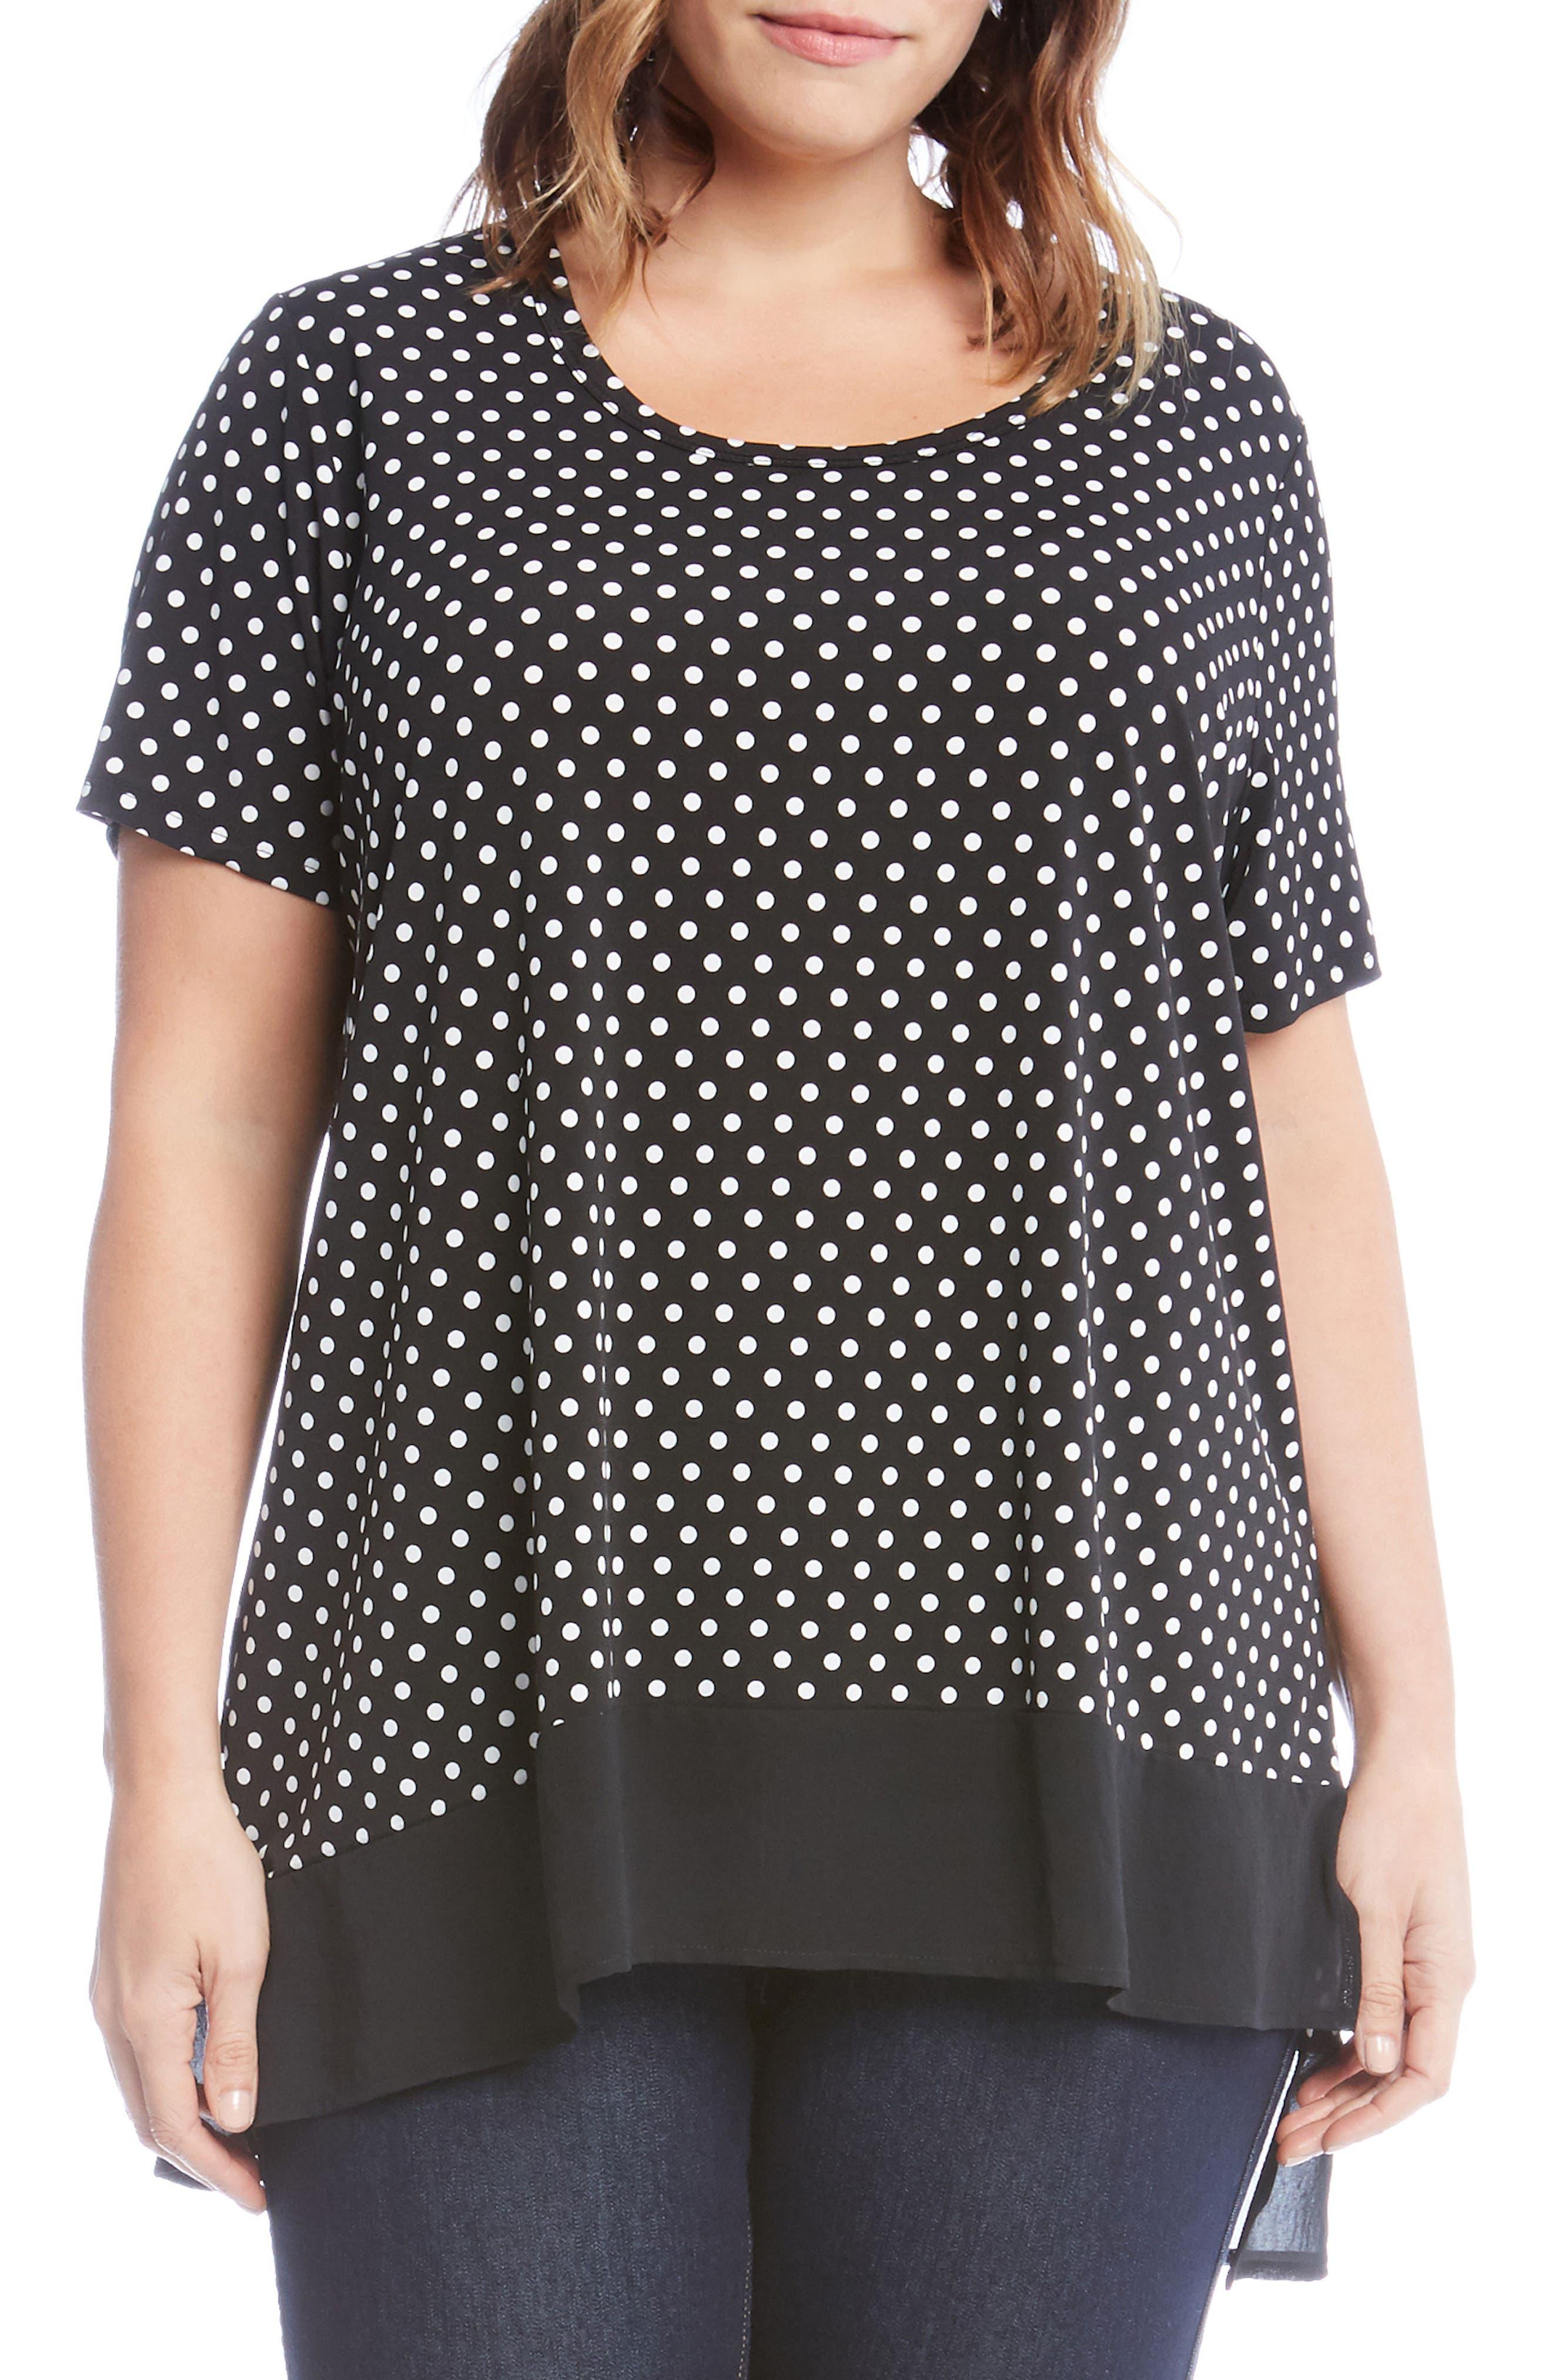 Alternate Image 1 Selected - Karen Kane Polka Dot Sheer Asymmetrical Hem Top (Plus Size)